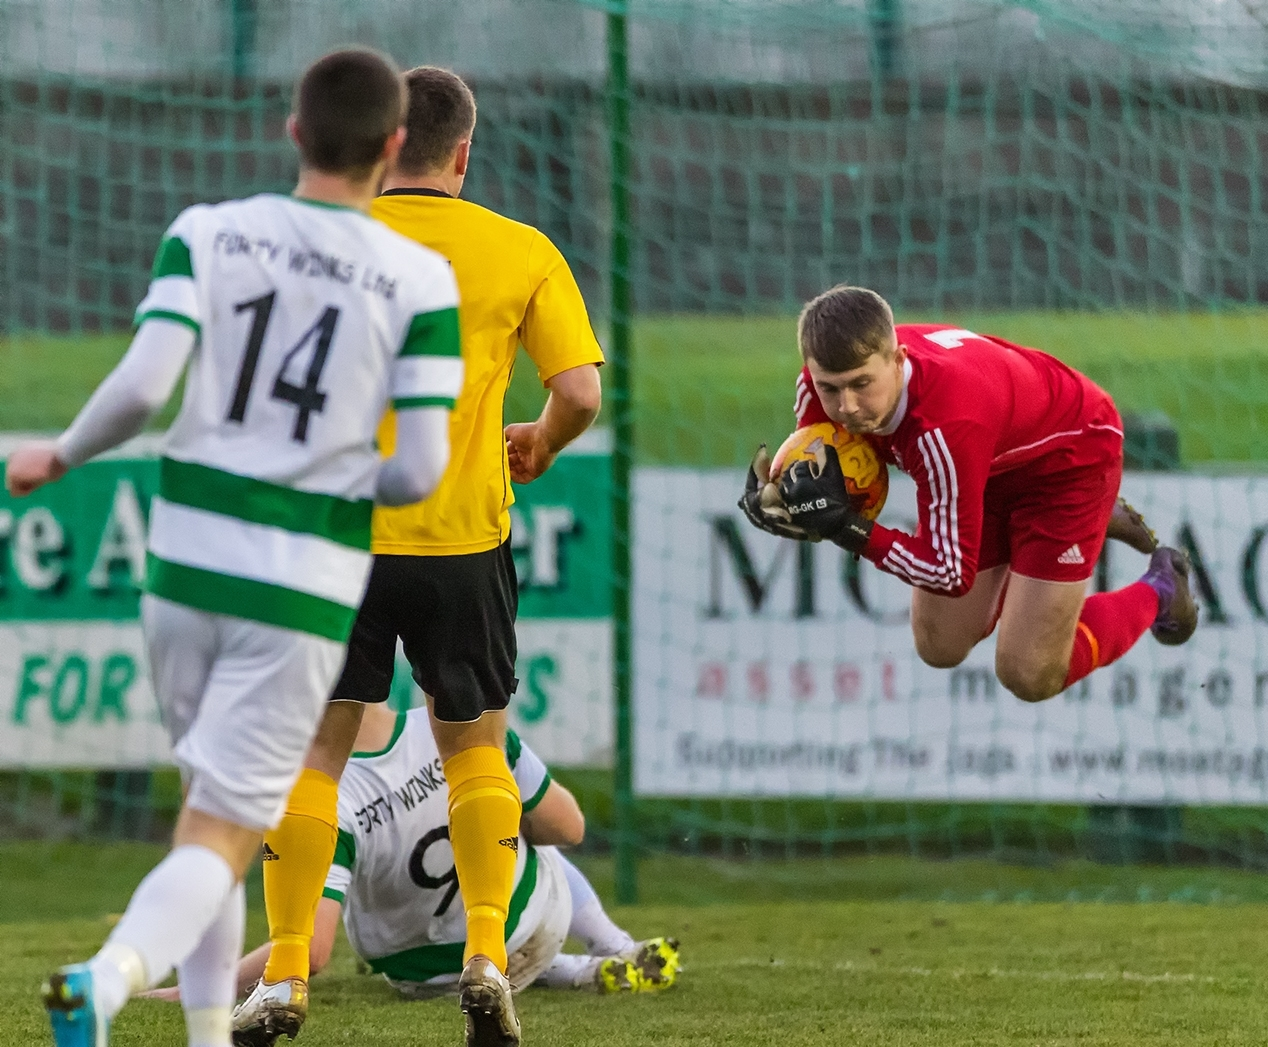 Nairn keeper Dylan MacLean makes a save